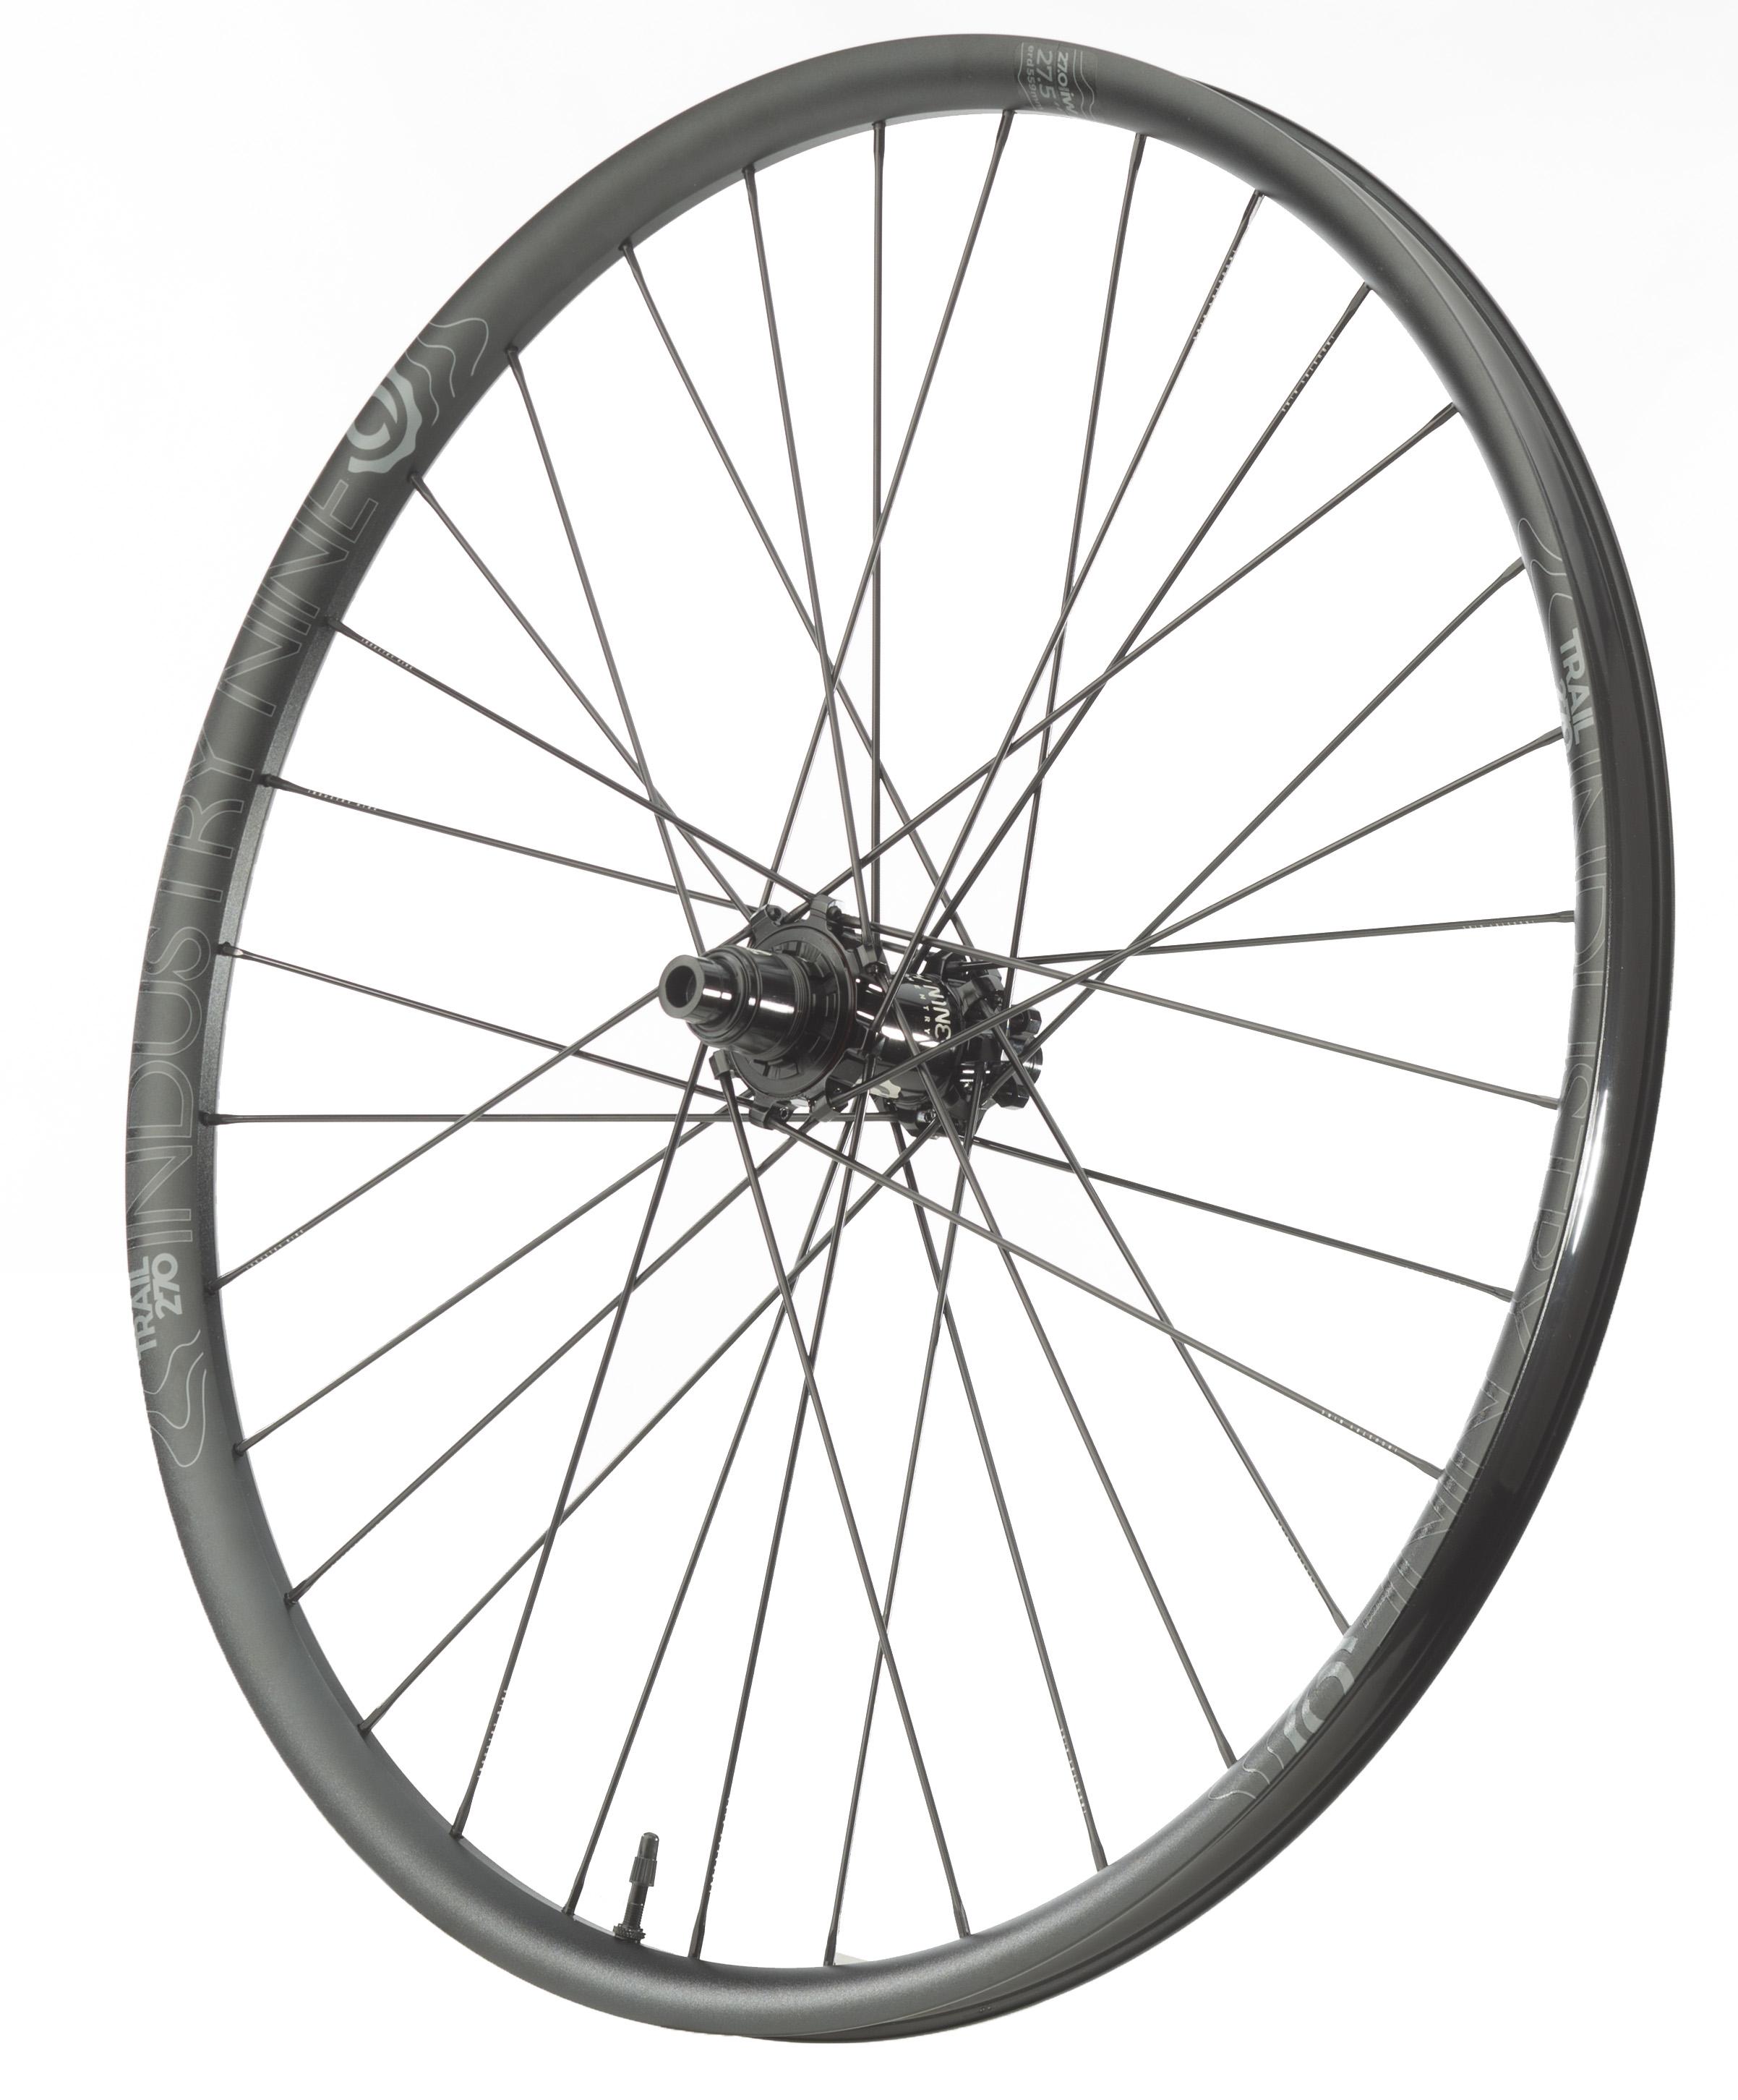 "Industry Nine Trail 270 Torch 27.5"" 32H Wheel"